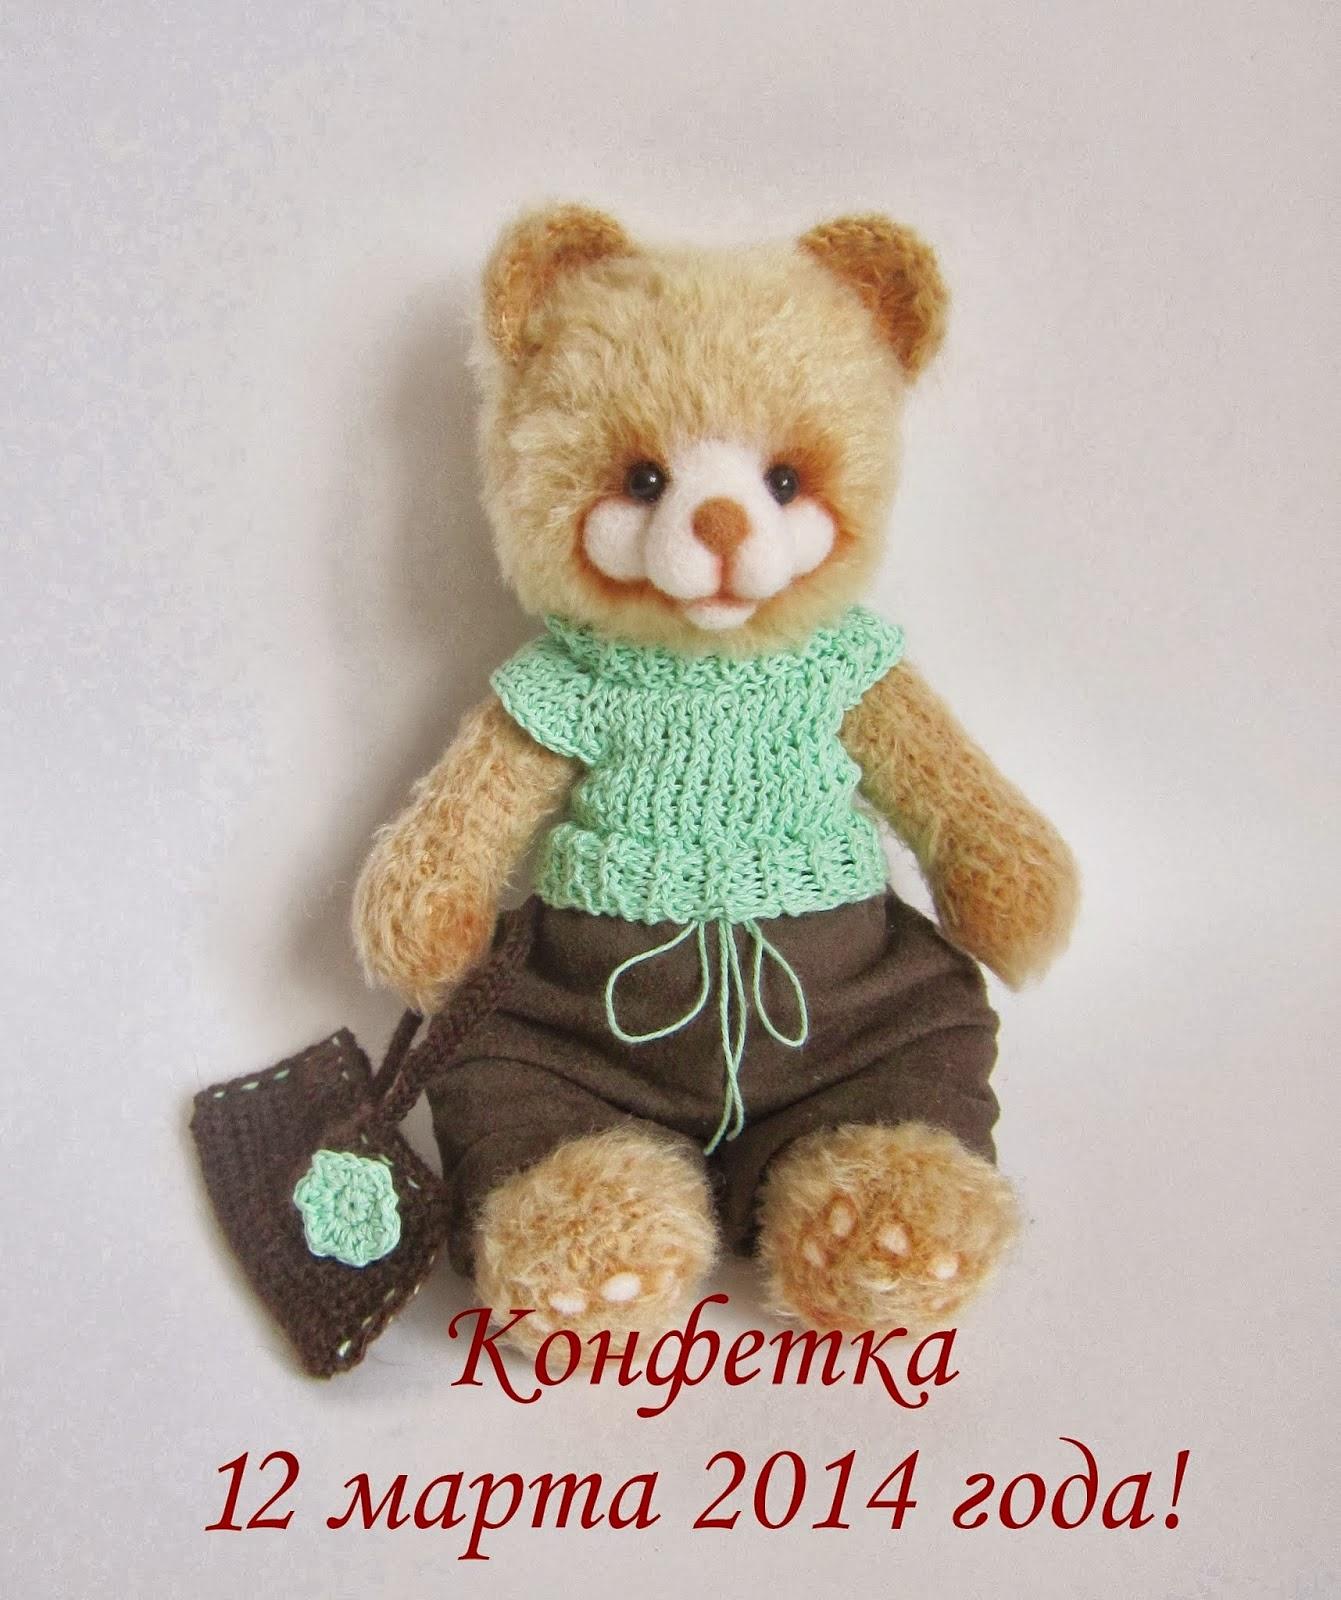 http://viktoriahobbies.blogspot.ru/2014/02/blog-post.html